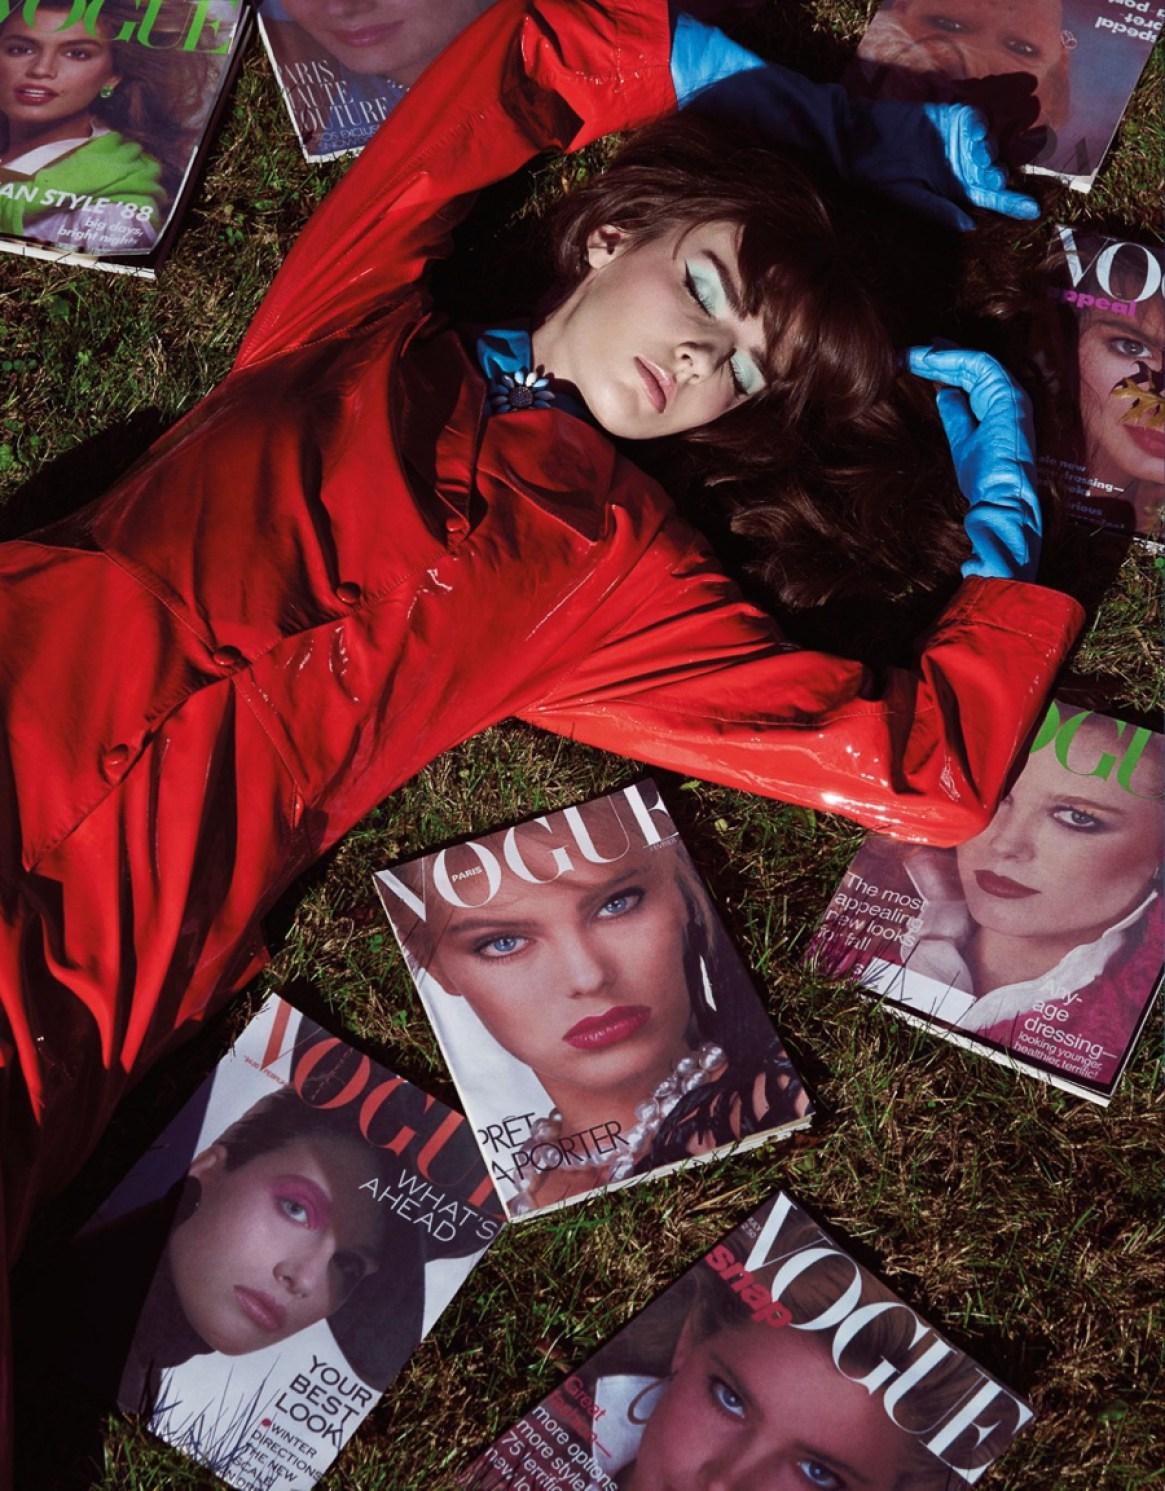 Yulia Erkamova - Yulia-Erkamova-by-Jamie-Nelson-2016_Ezter-Boldov-editorials_Ezter-Boldov-fashion-style_Nika-Lauratis-editorials_Nika-Lauratis-personal-fashion-style_Lisa-Jarvis-stylist_vogue-taiwan-editorials-2016_top-editorial-bloggers-australia-uk-africa-2016_best-british-fashion-blogs-2016